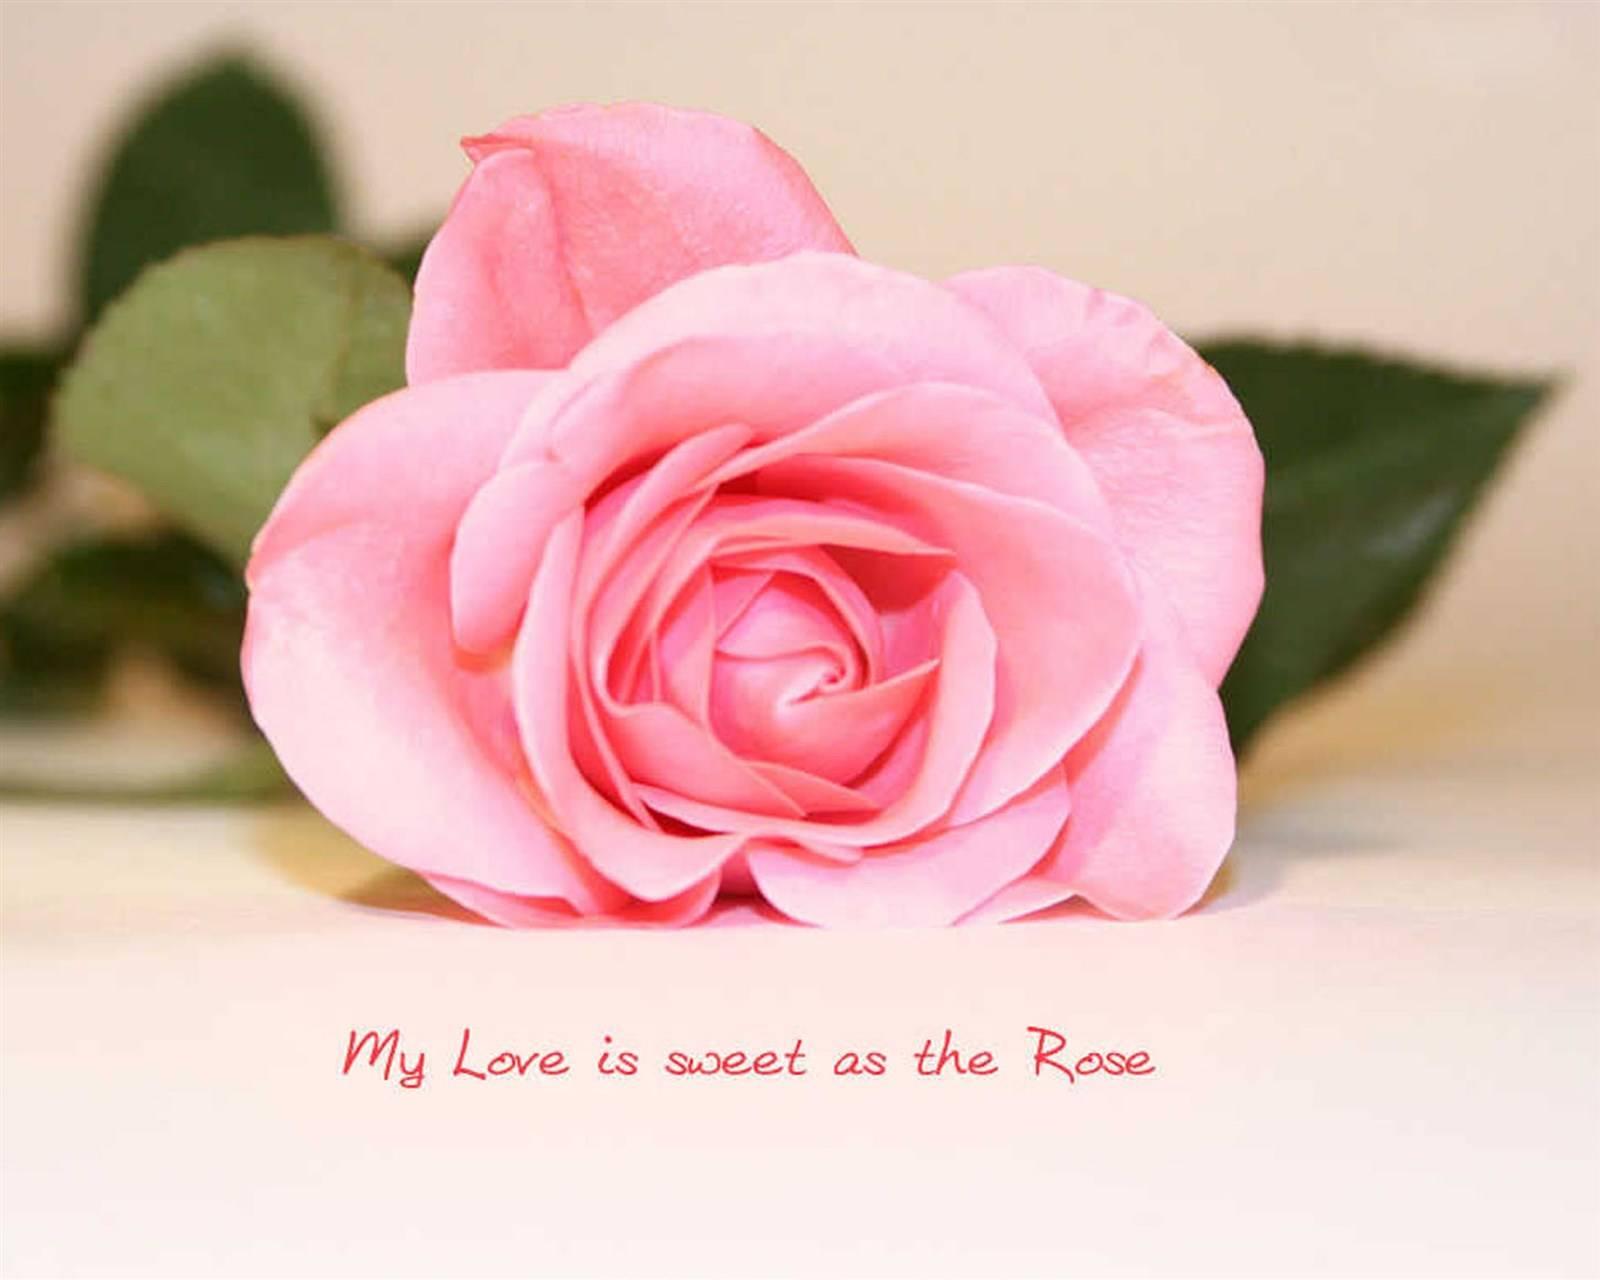 My Love